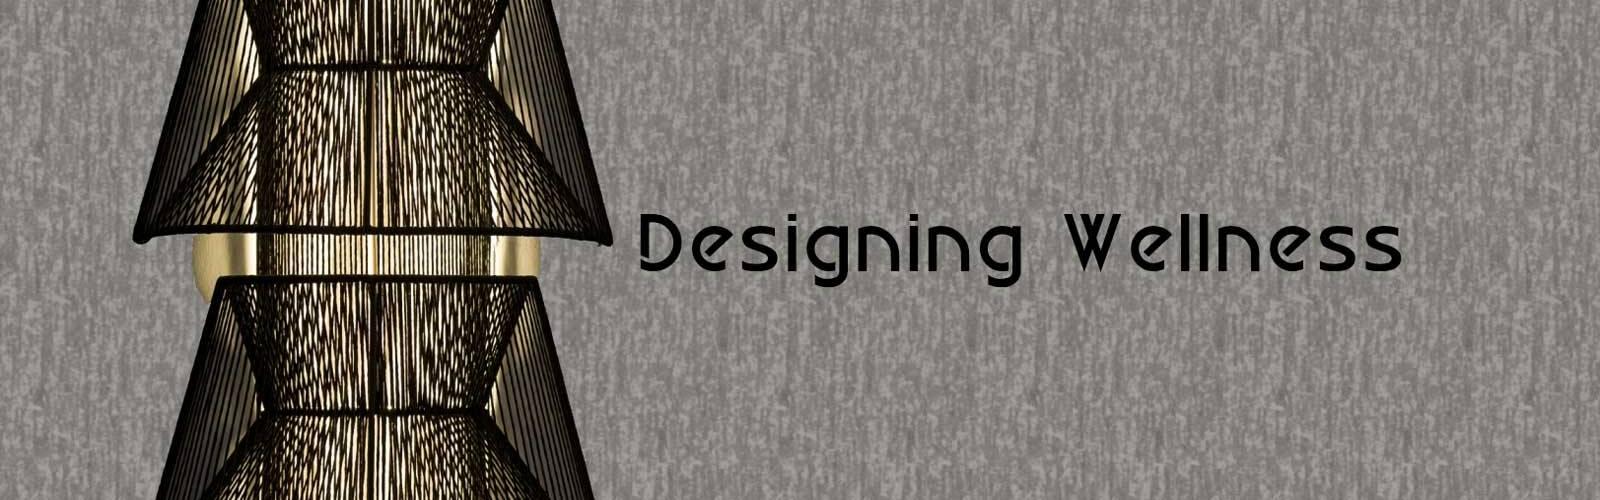 designing wellness